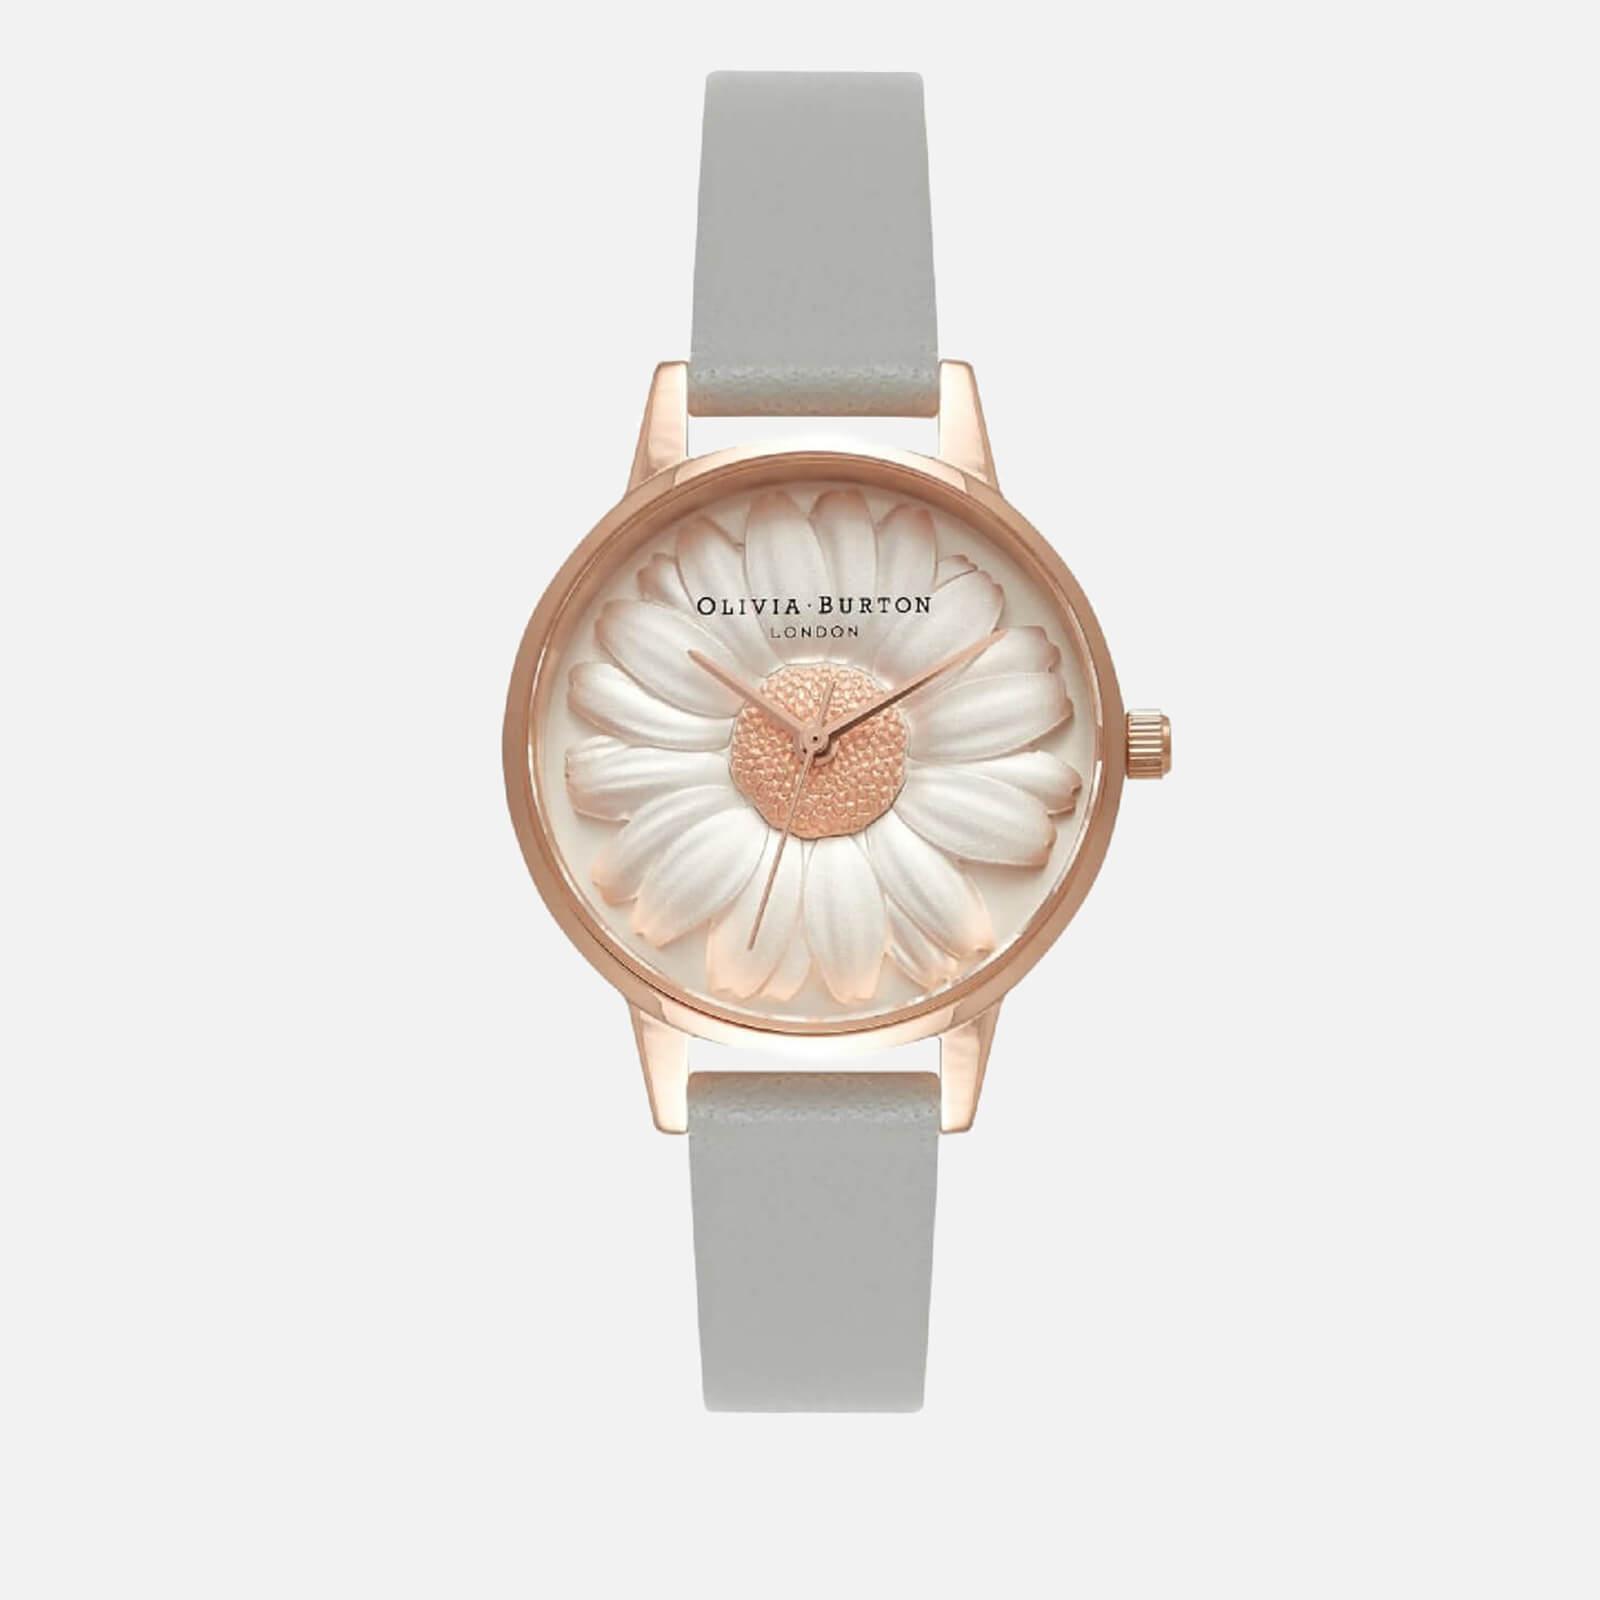 Olivia Burton Women's 3D Daisy Watch - Grey/Rose Gold